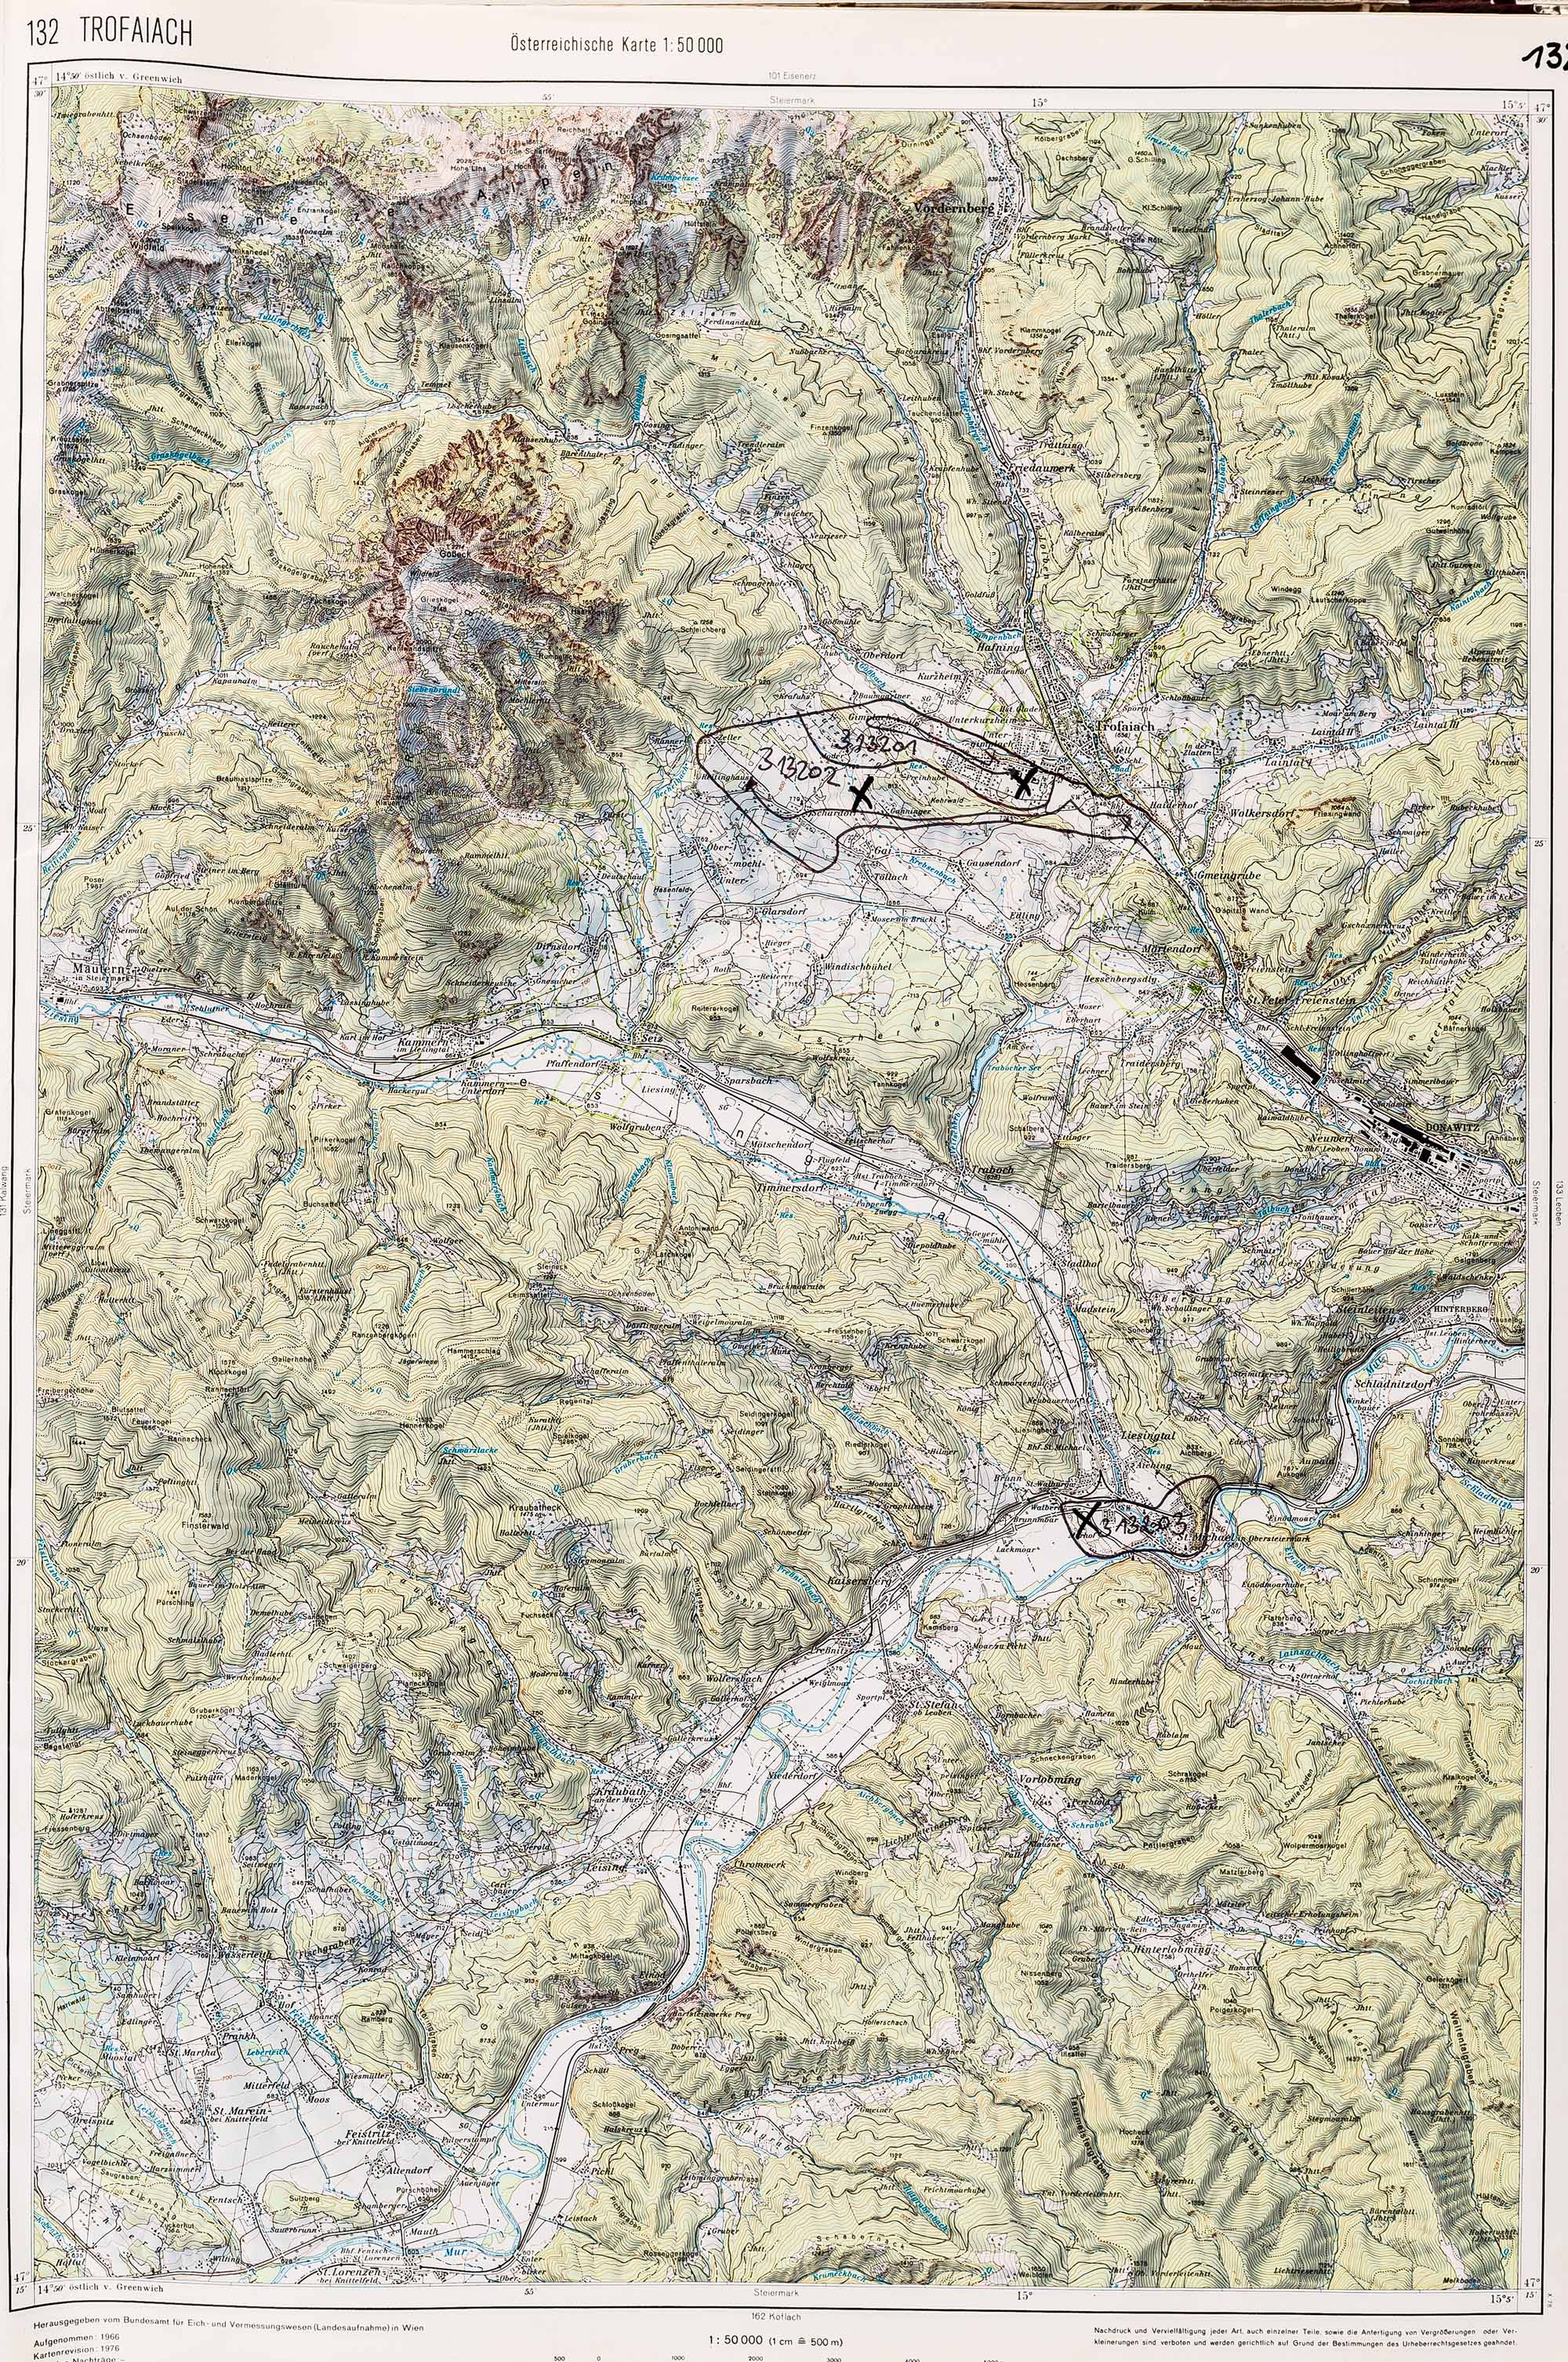 1983-1986 Karte 132